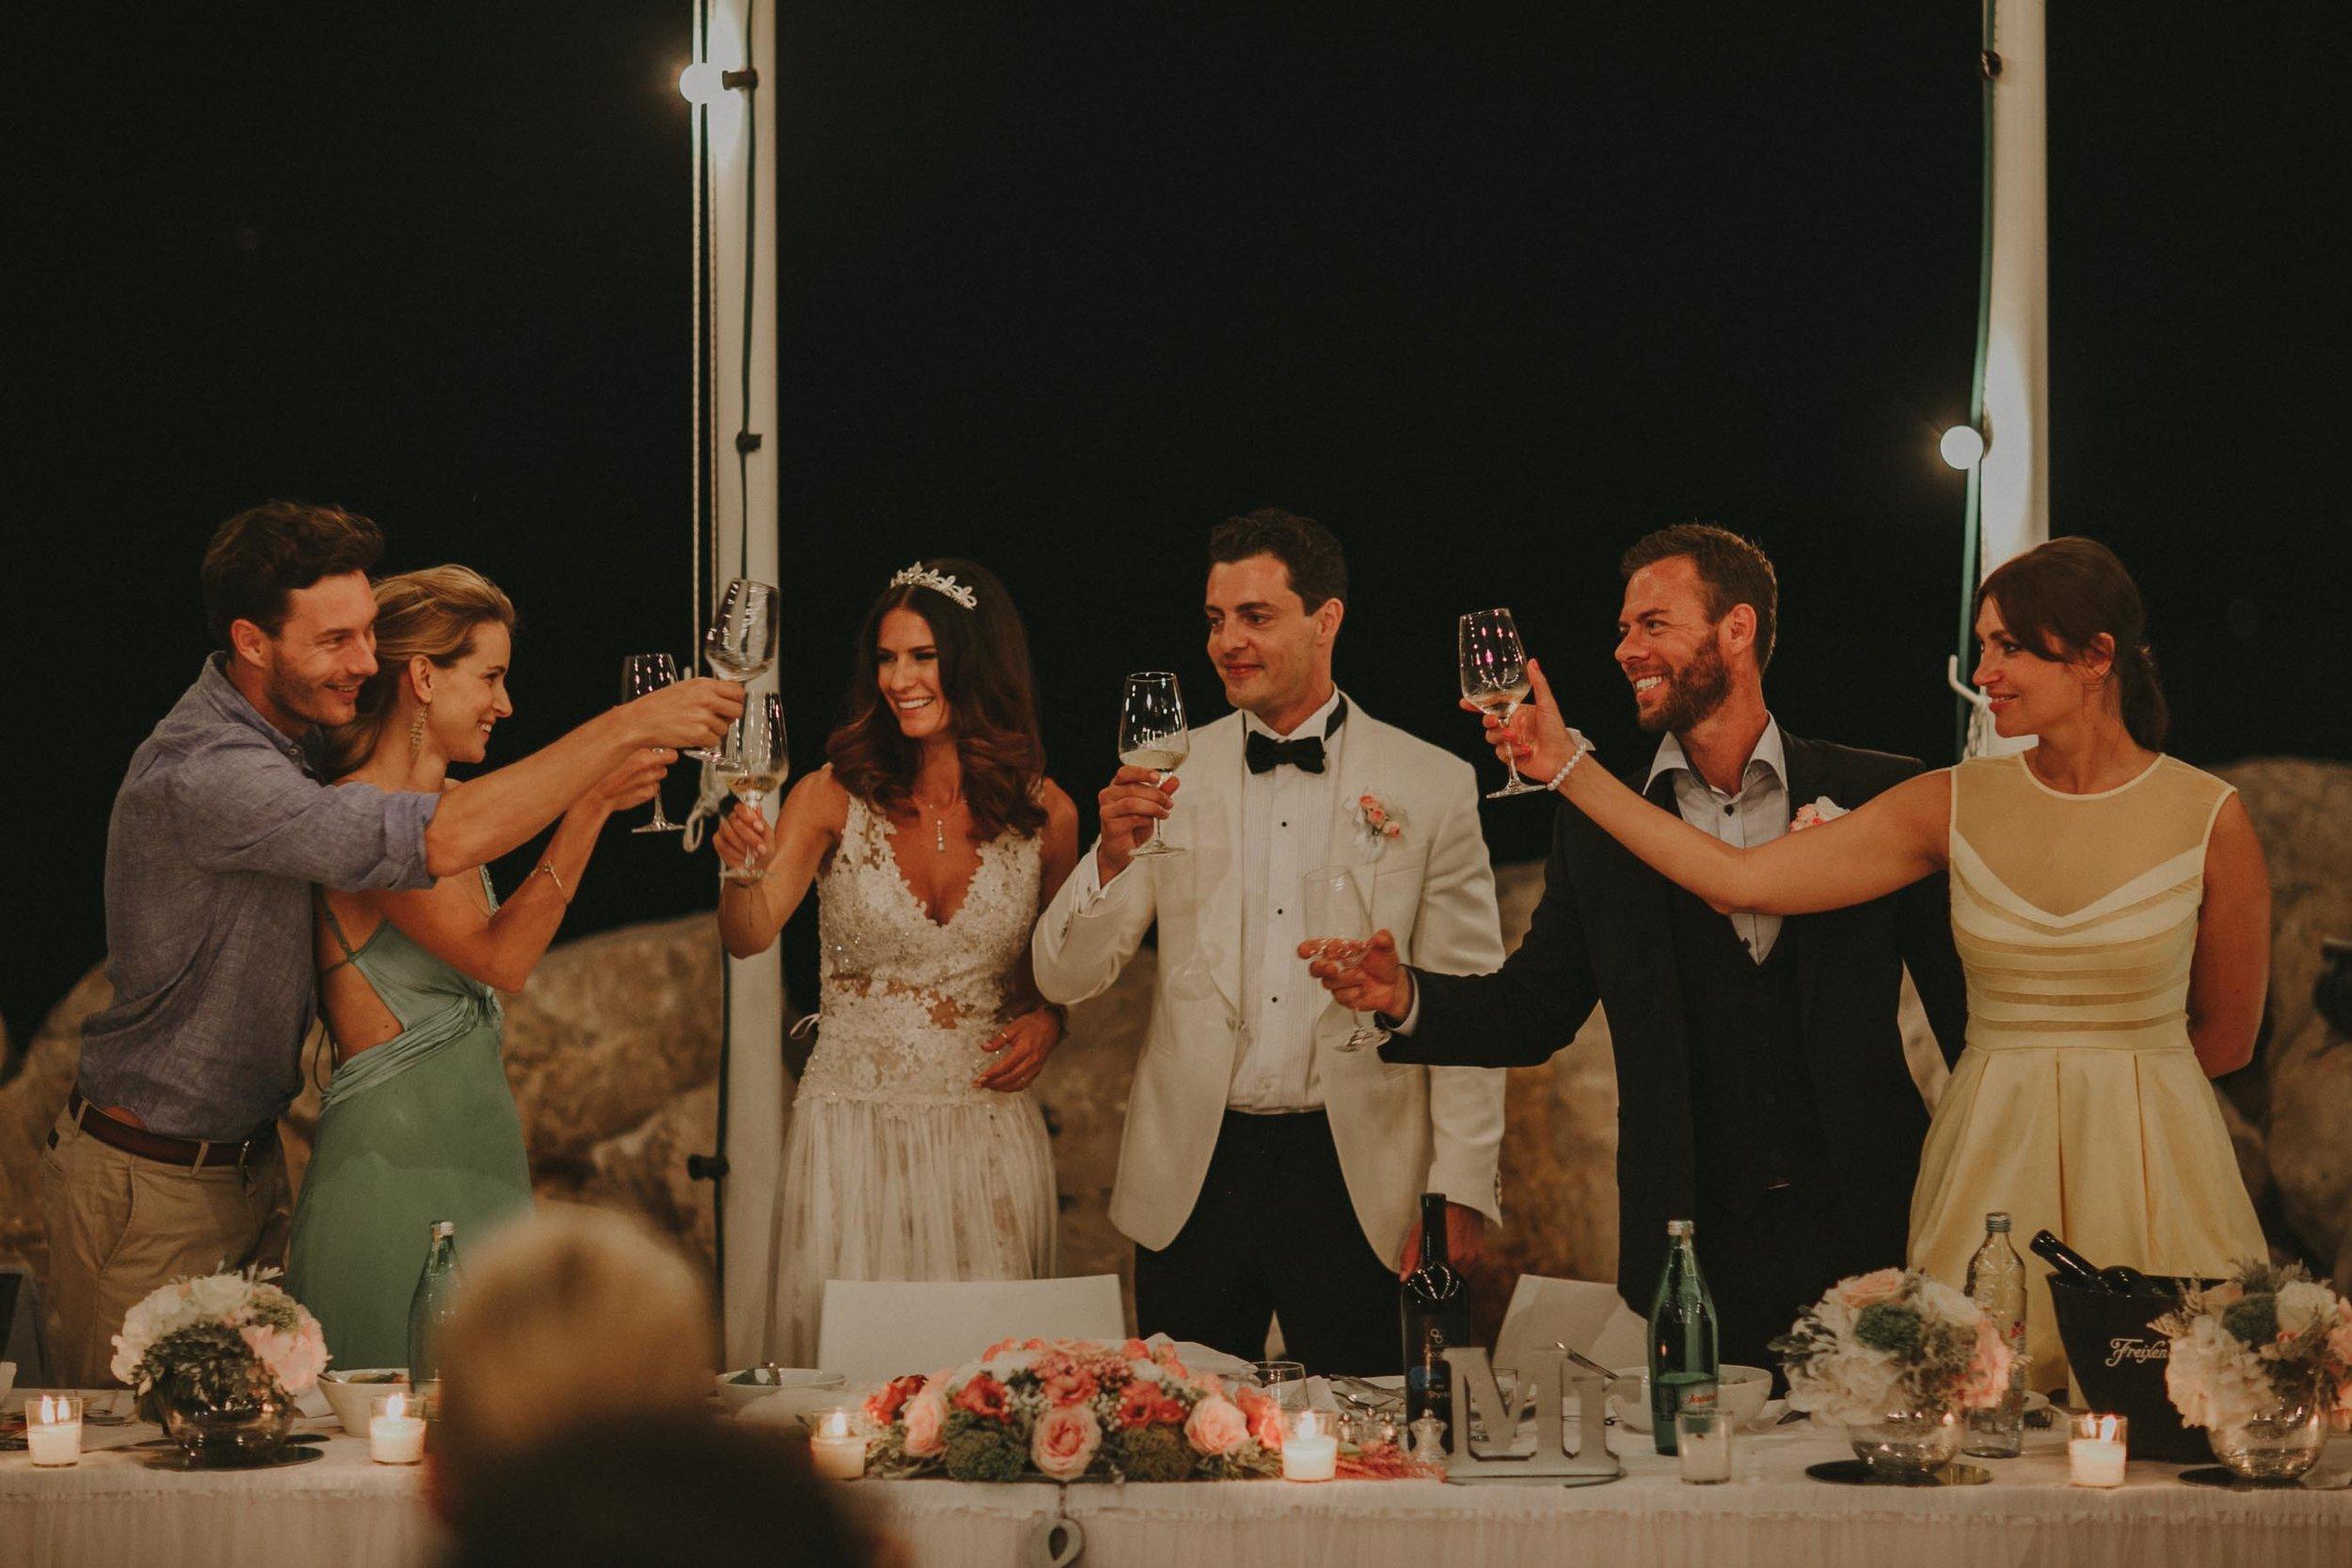 sylvia&dimitri-Wedding-Crvena_Luka-Croatia-94(6807).jpg